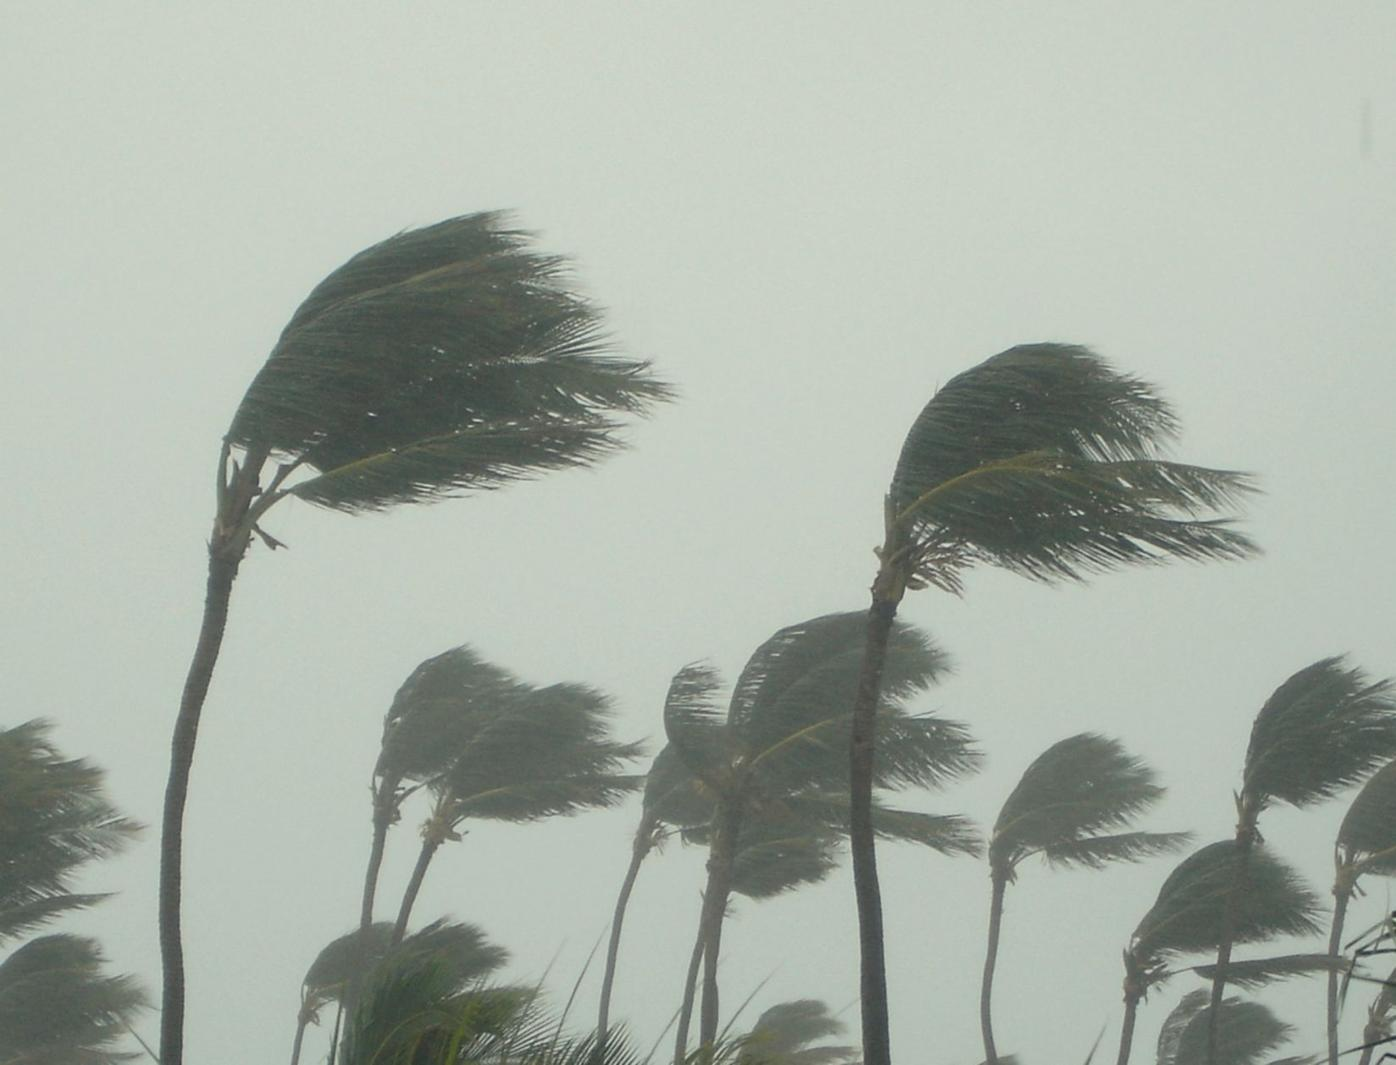 Figure 1:  Hurricane Image